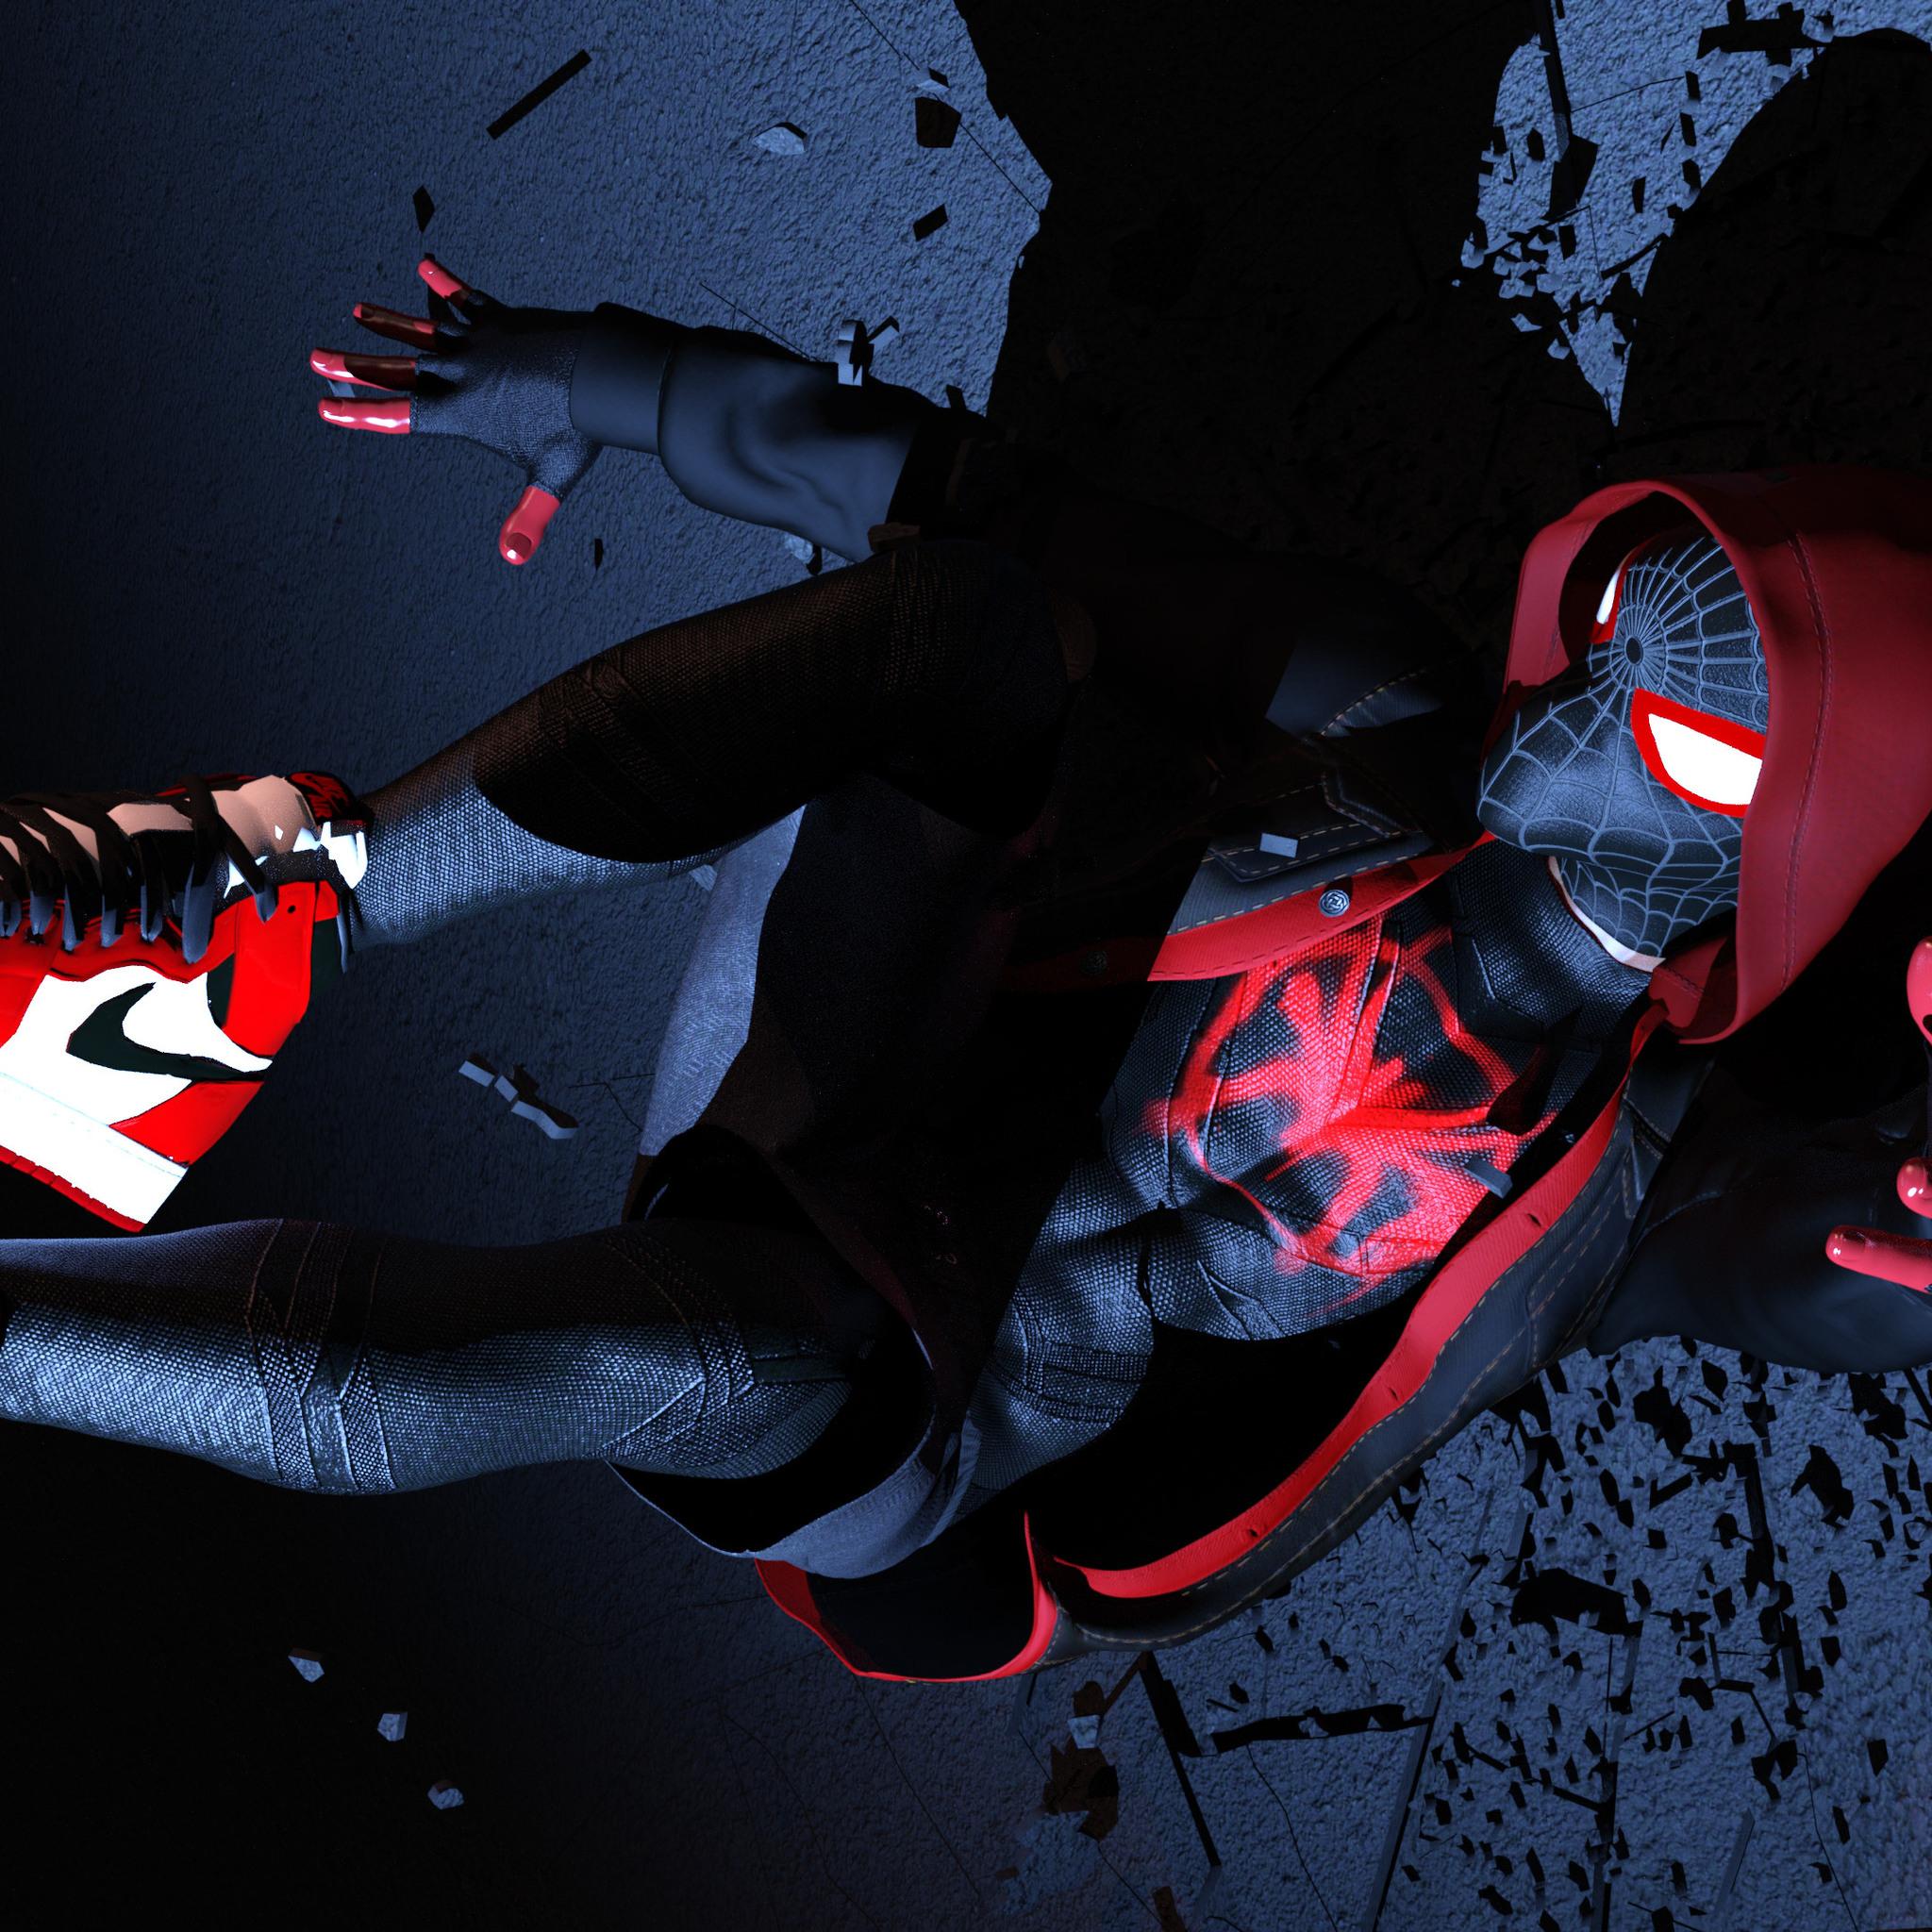 2048x2048 Spiderman Miles Morales 4k Ipad Air Hd 4k Wallpapers